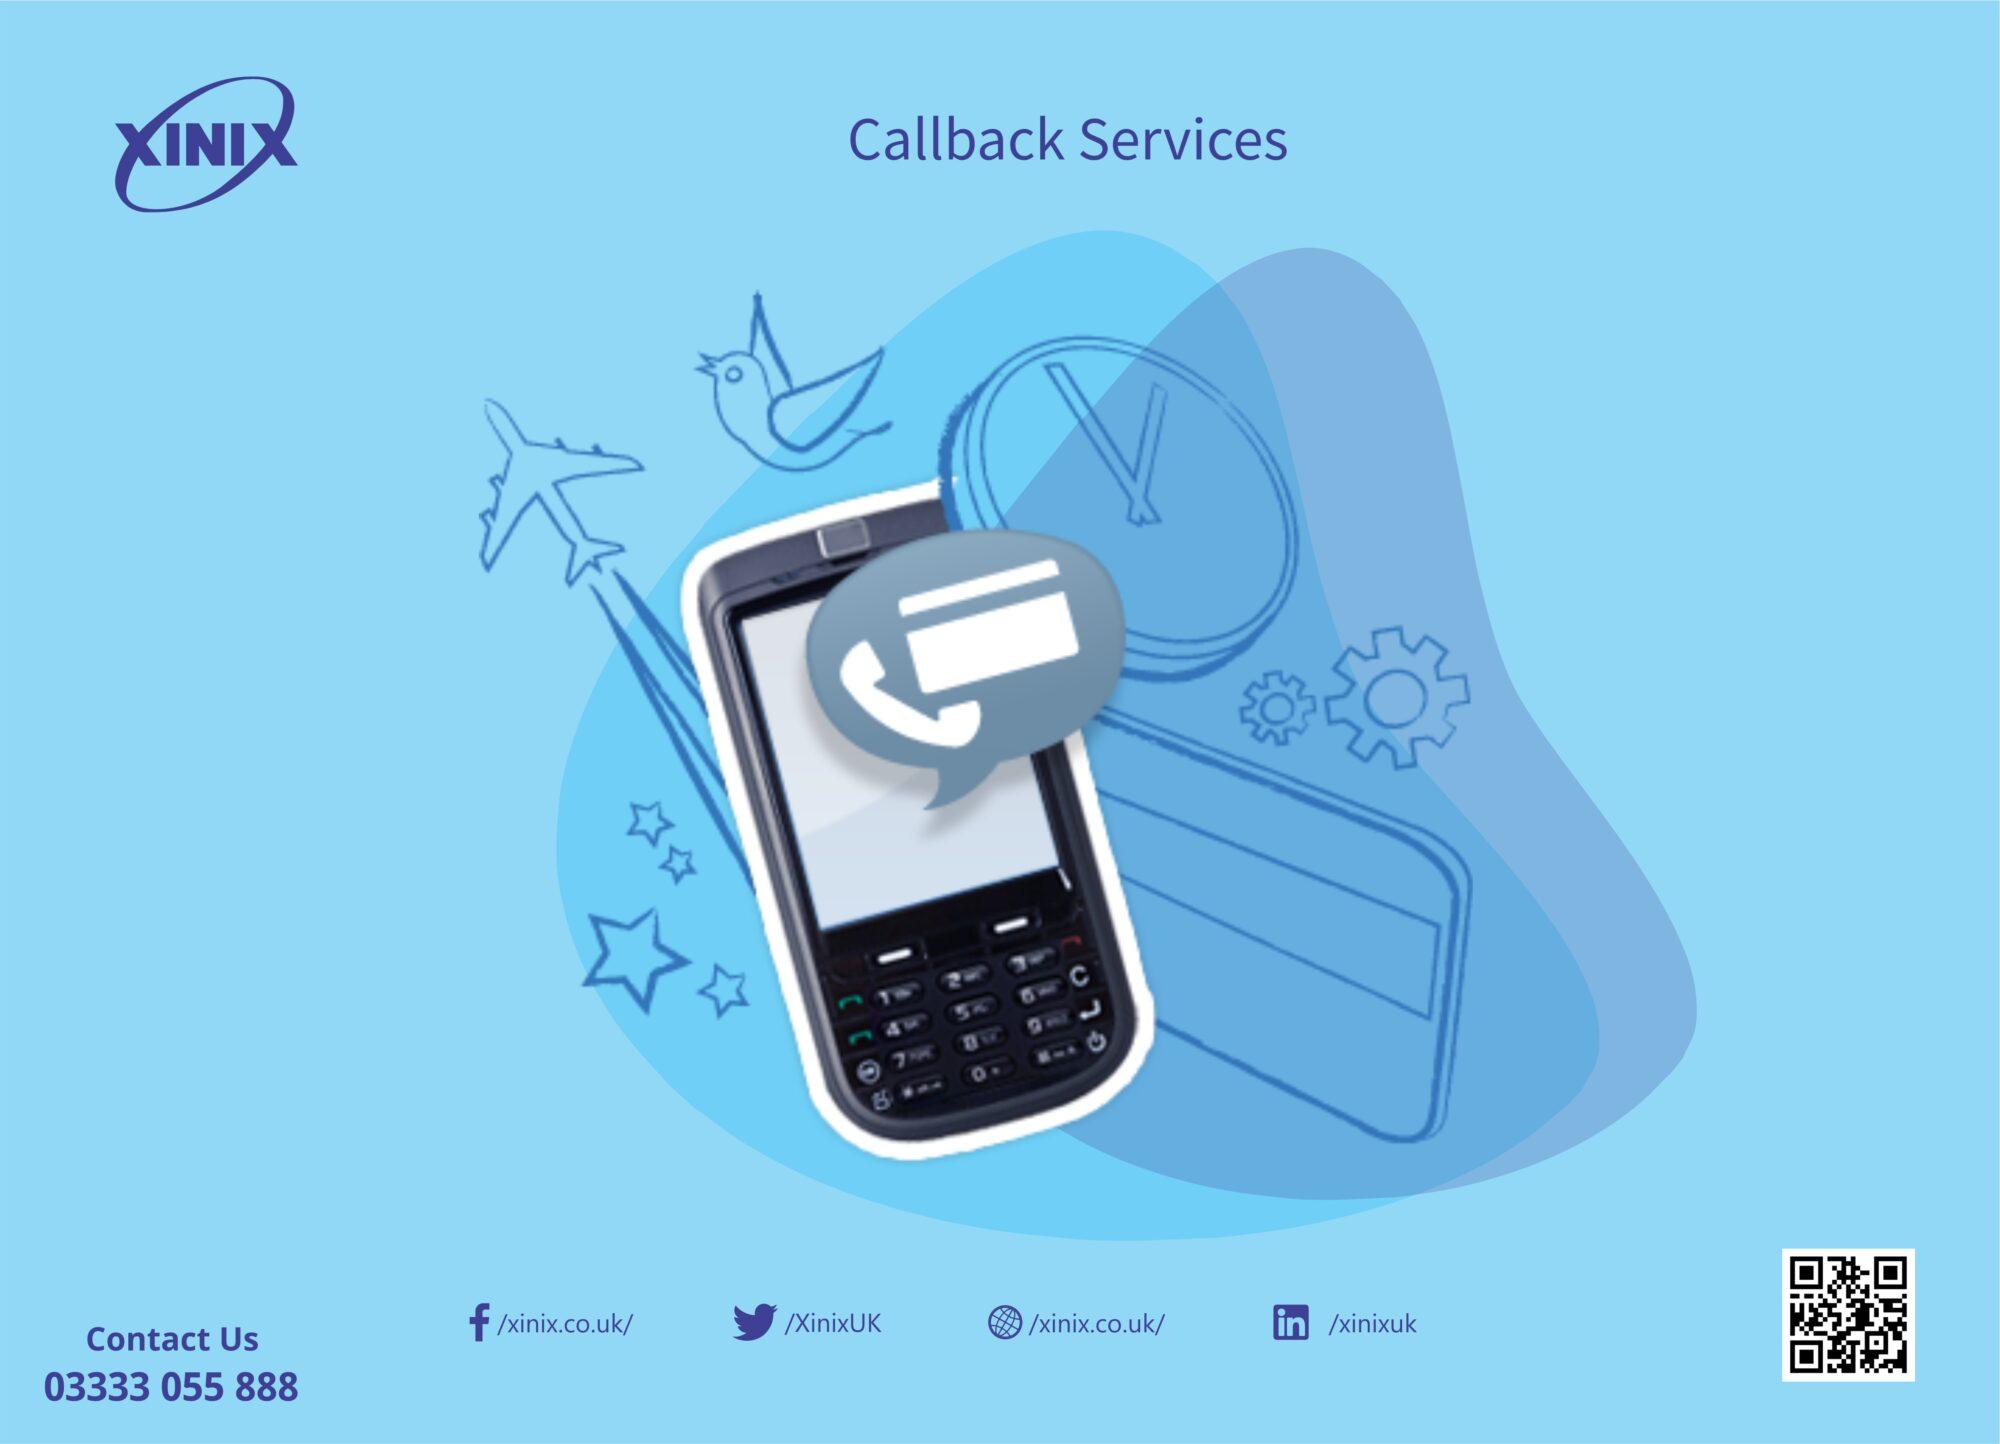 Callback Services